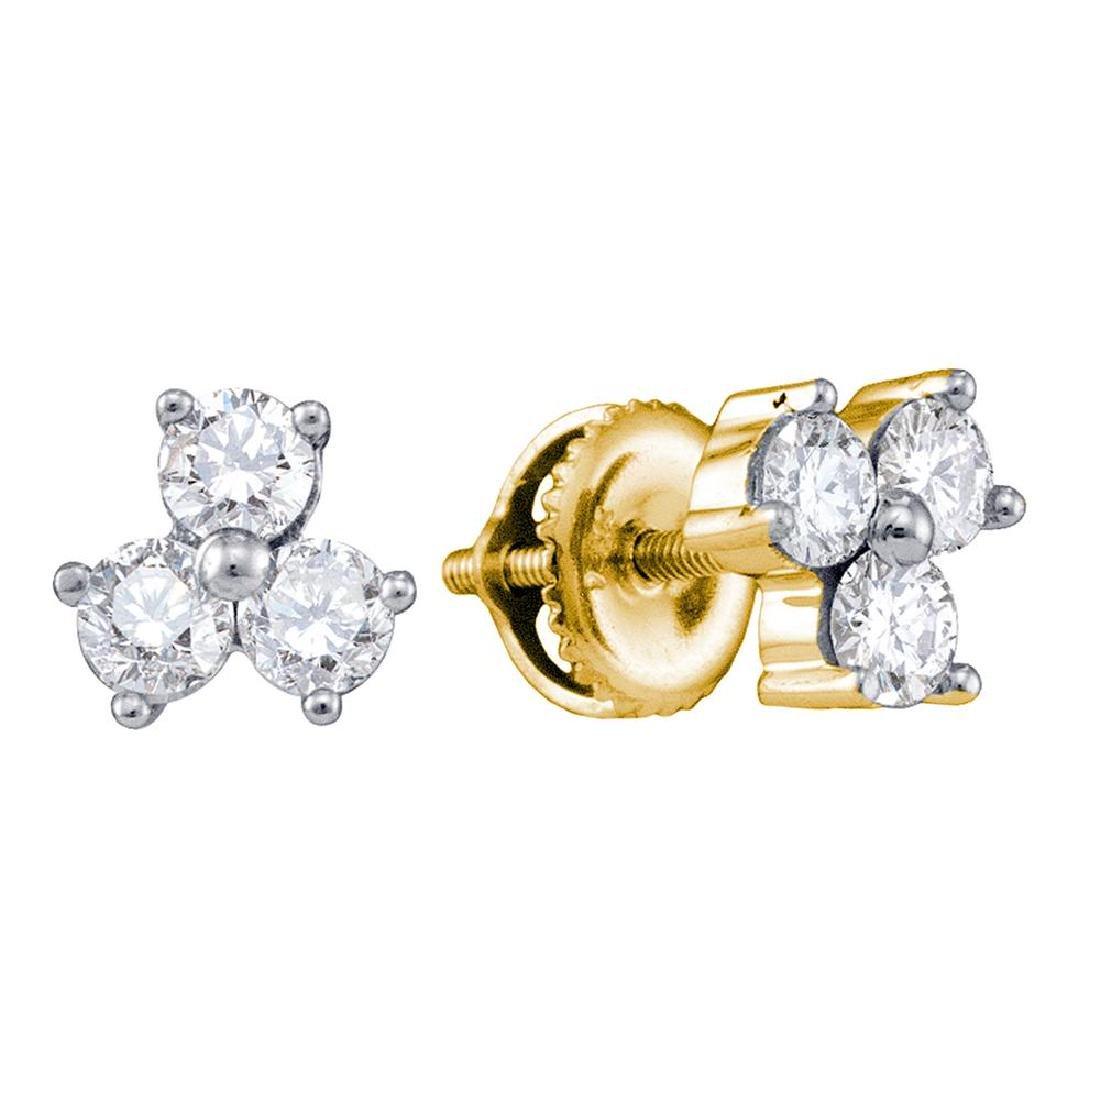 0.56 CTW Diamond Stud Earrings 14KT Yellow Gold -